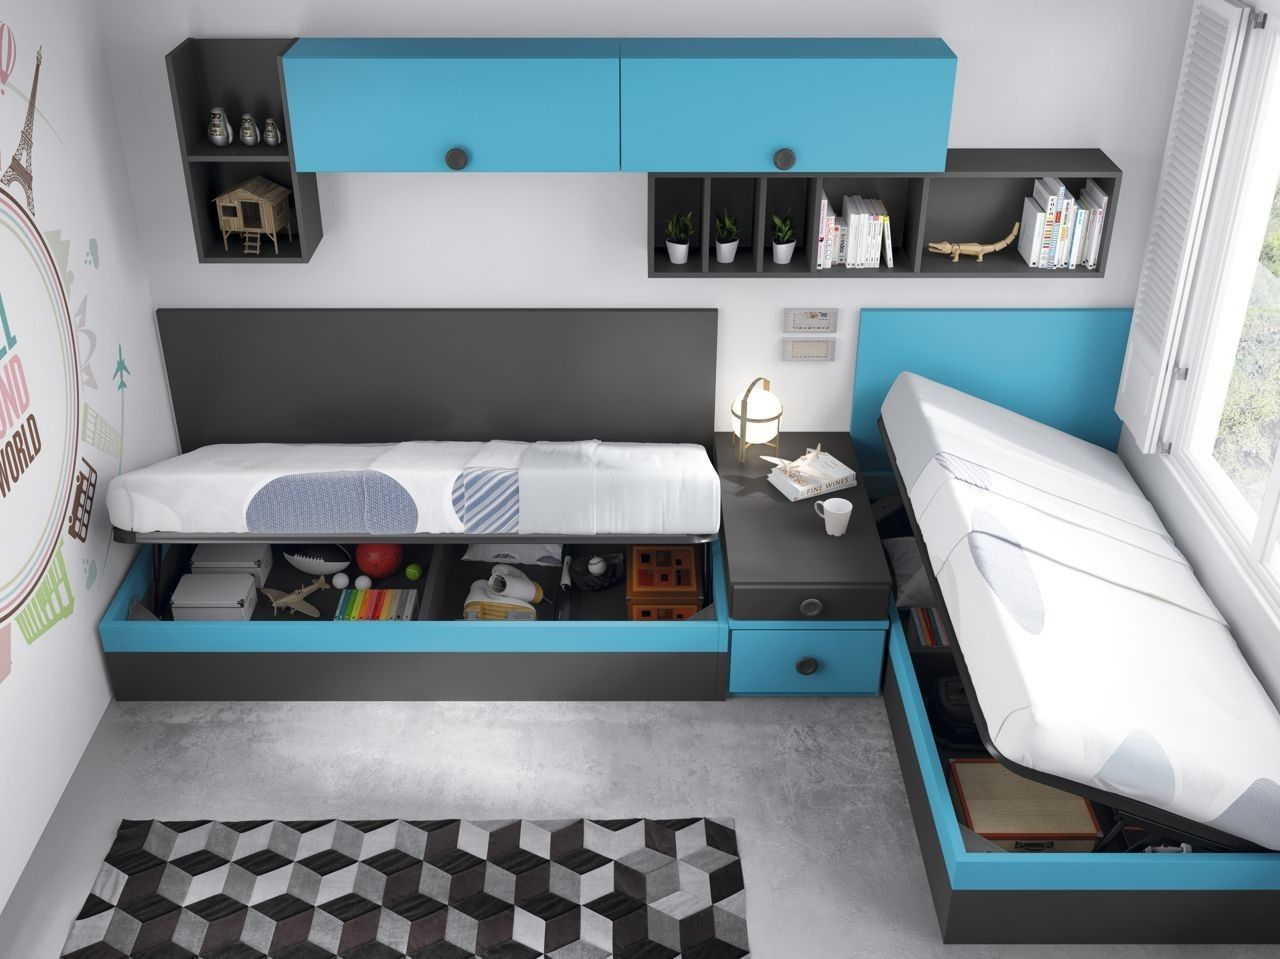 Dormitorios modernos juveniles buscar con google for Literas originales para un cuarto juvenil